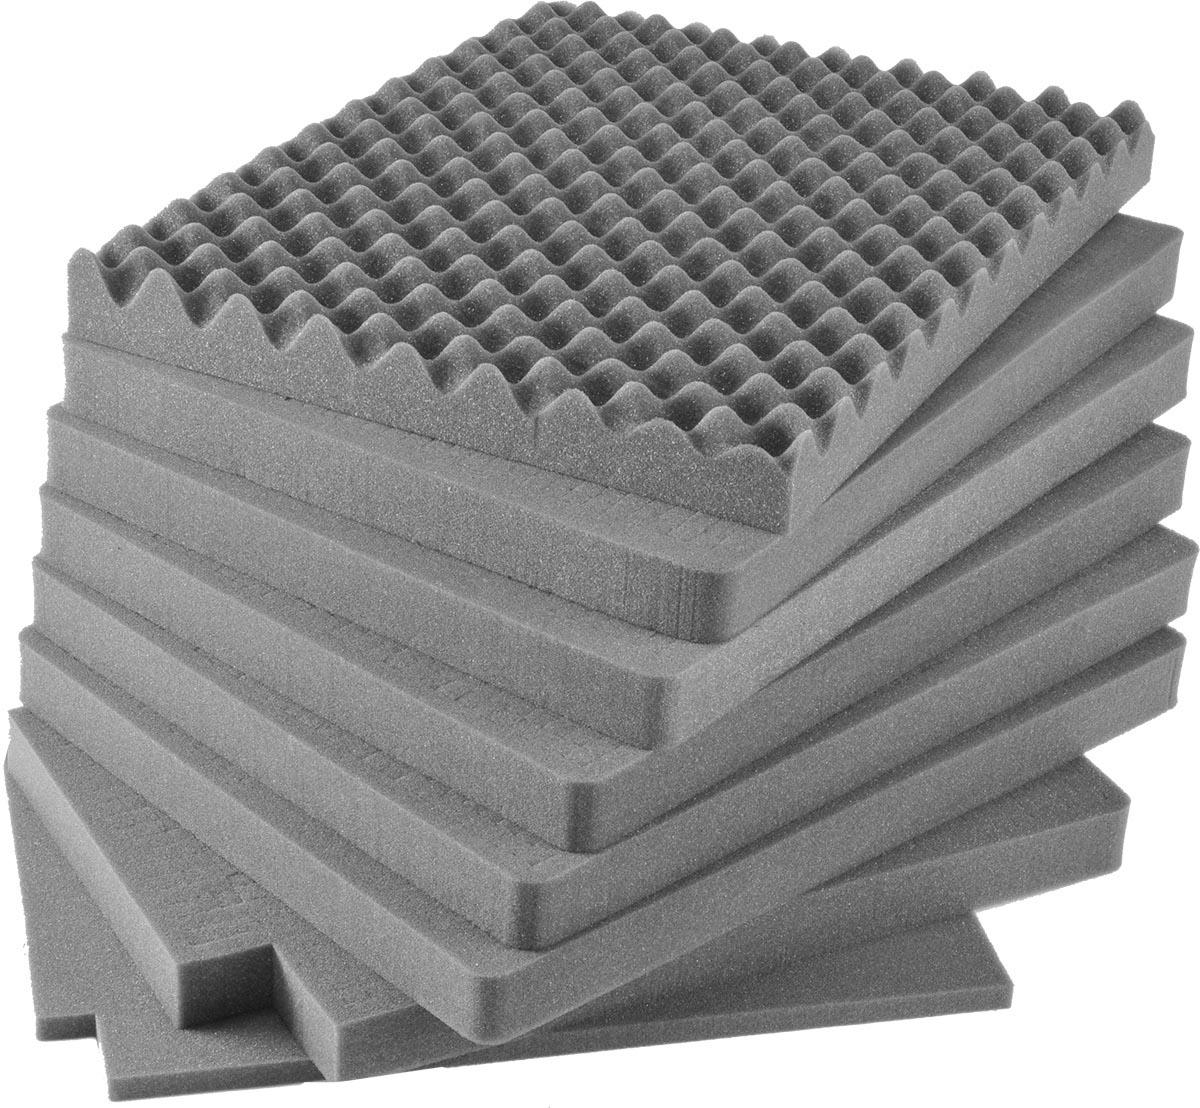 pelican im2750 foam replacement set